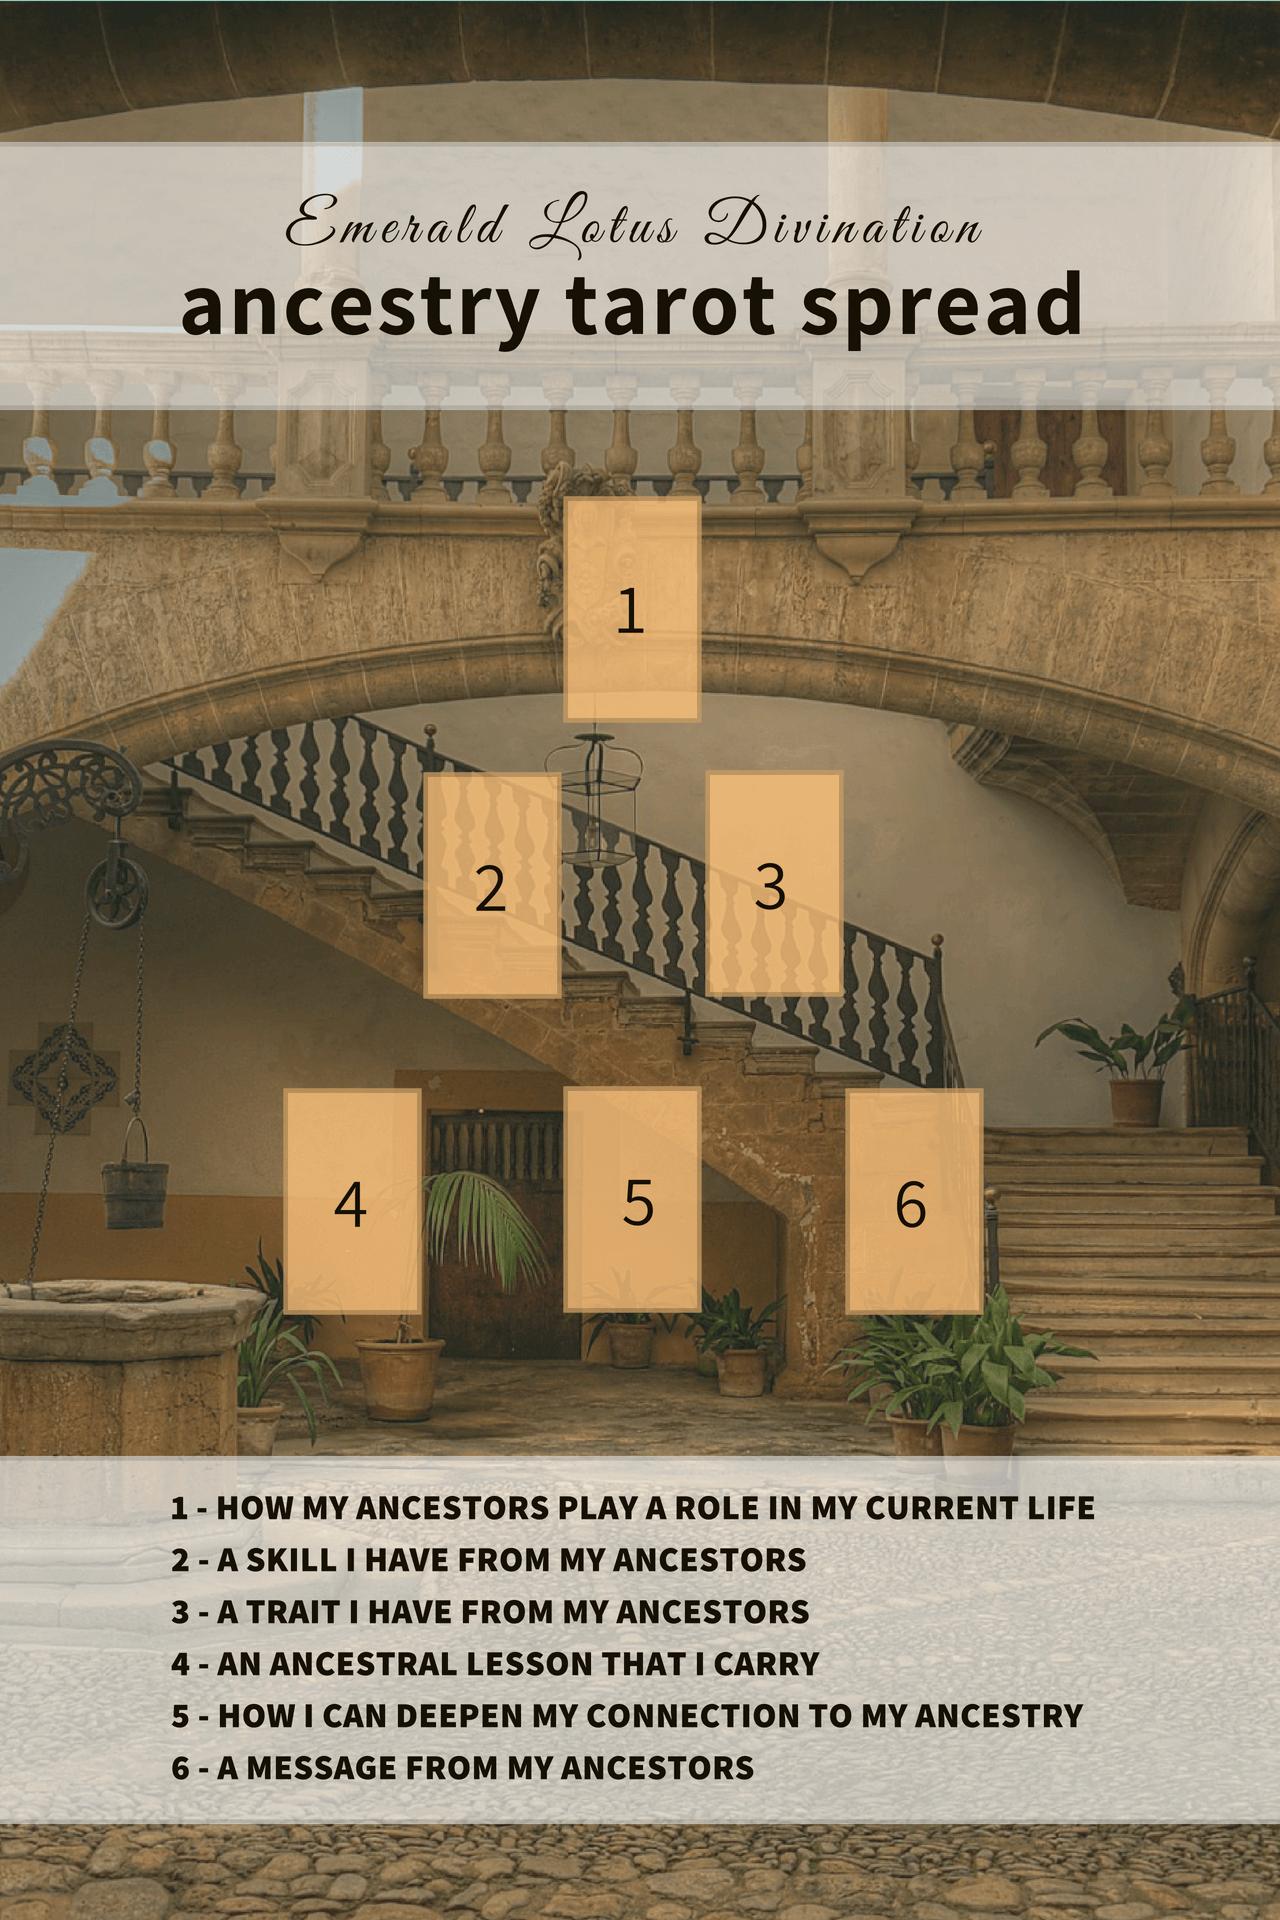 Ancestry-Tarot-Spread-1.png